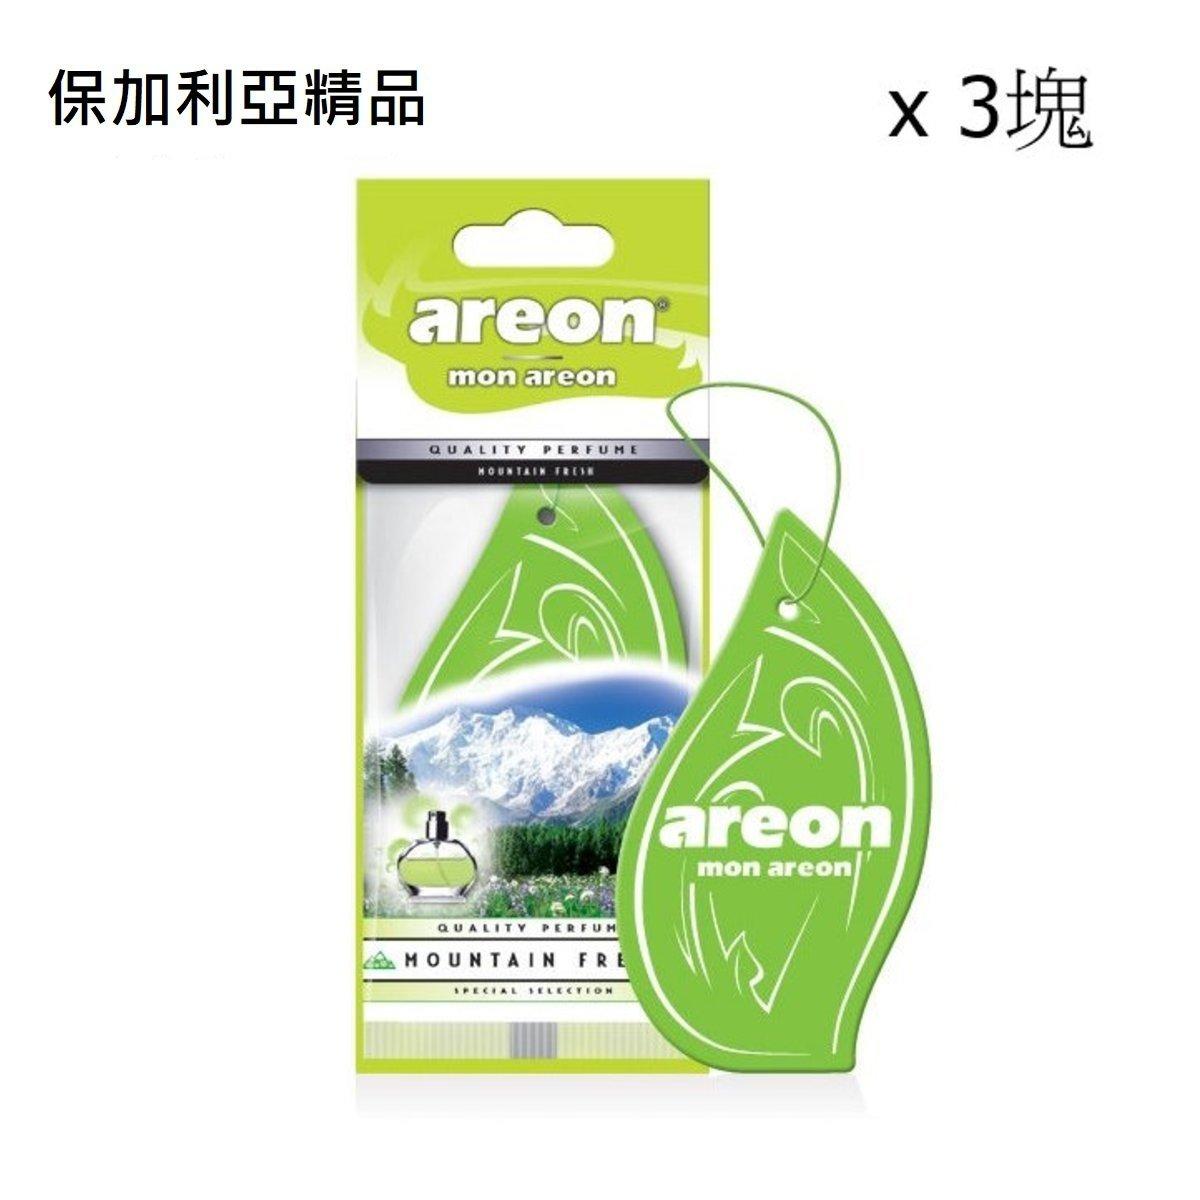 Mon Areon 悠閒品味系列 香薰片 - 清新高原 (3 片裝)